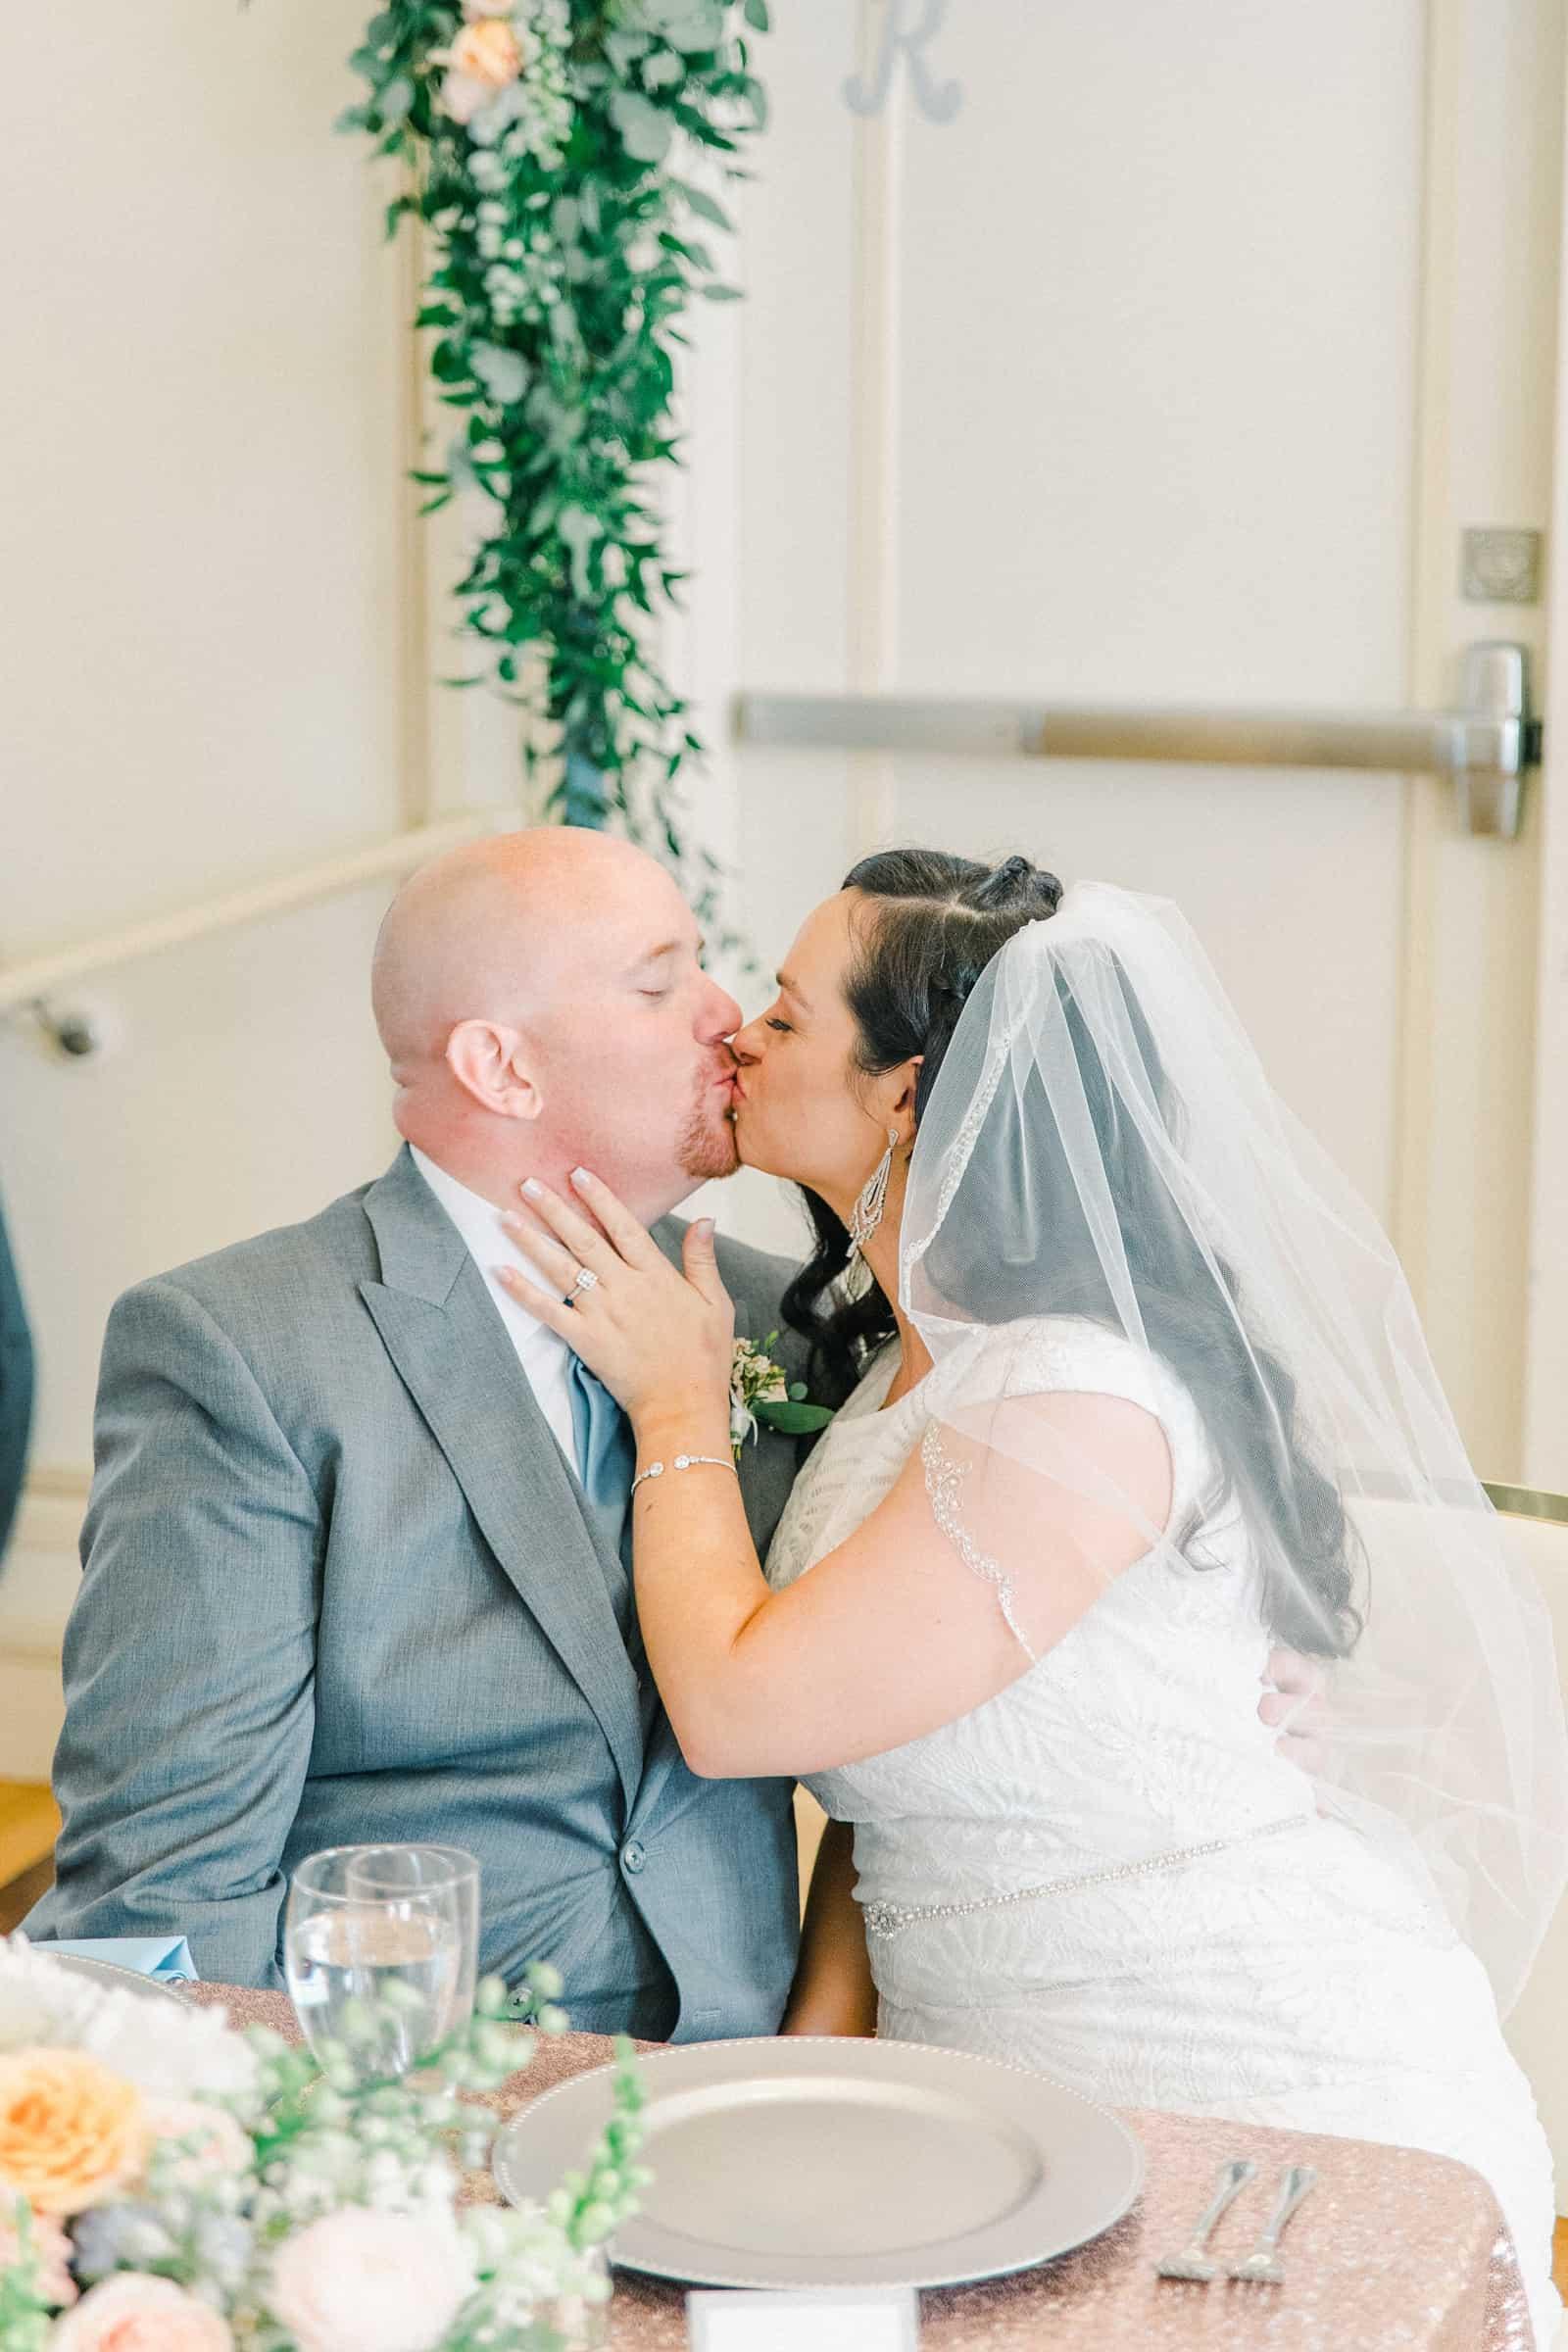 Thomas S. Monson Center Wedding, Salt Lake LDS Temple Wedding, Utah wedding photography, bride and groom kiss